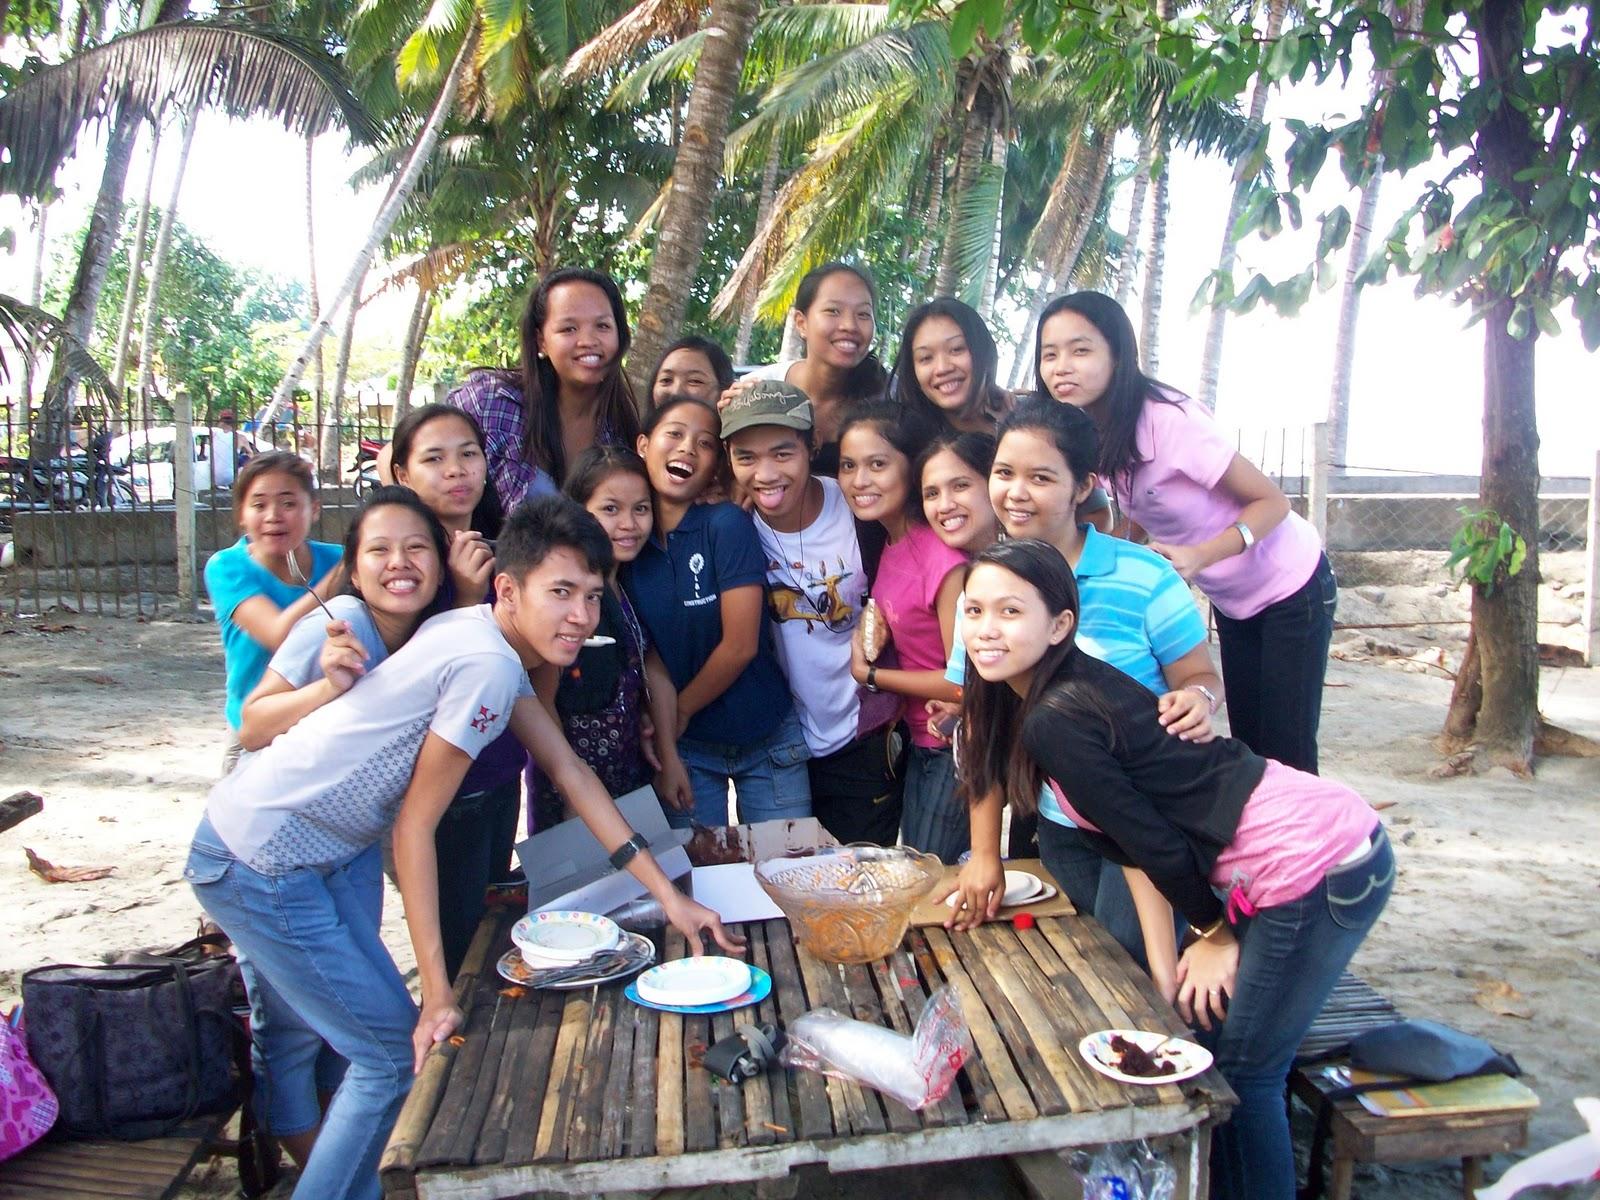 echUssera: having fun with friends